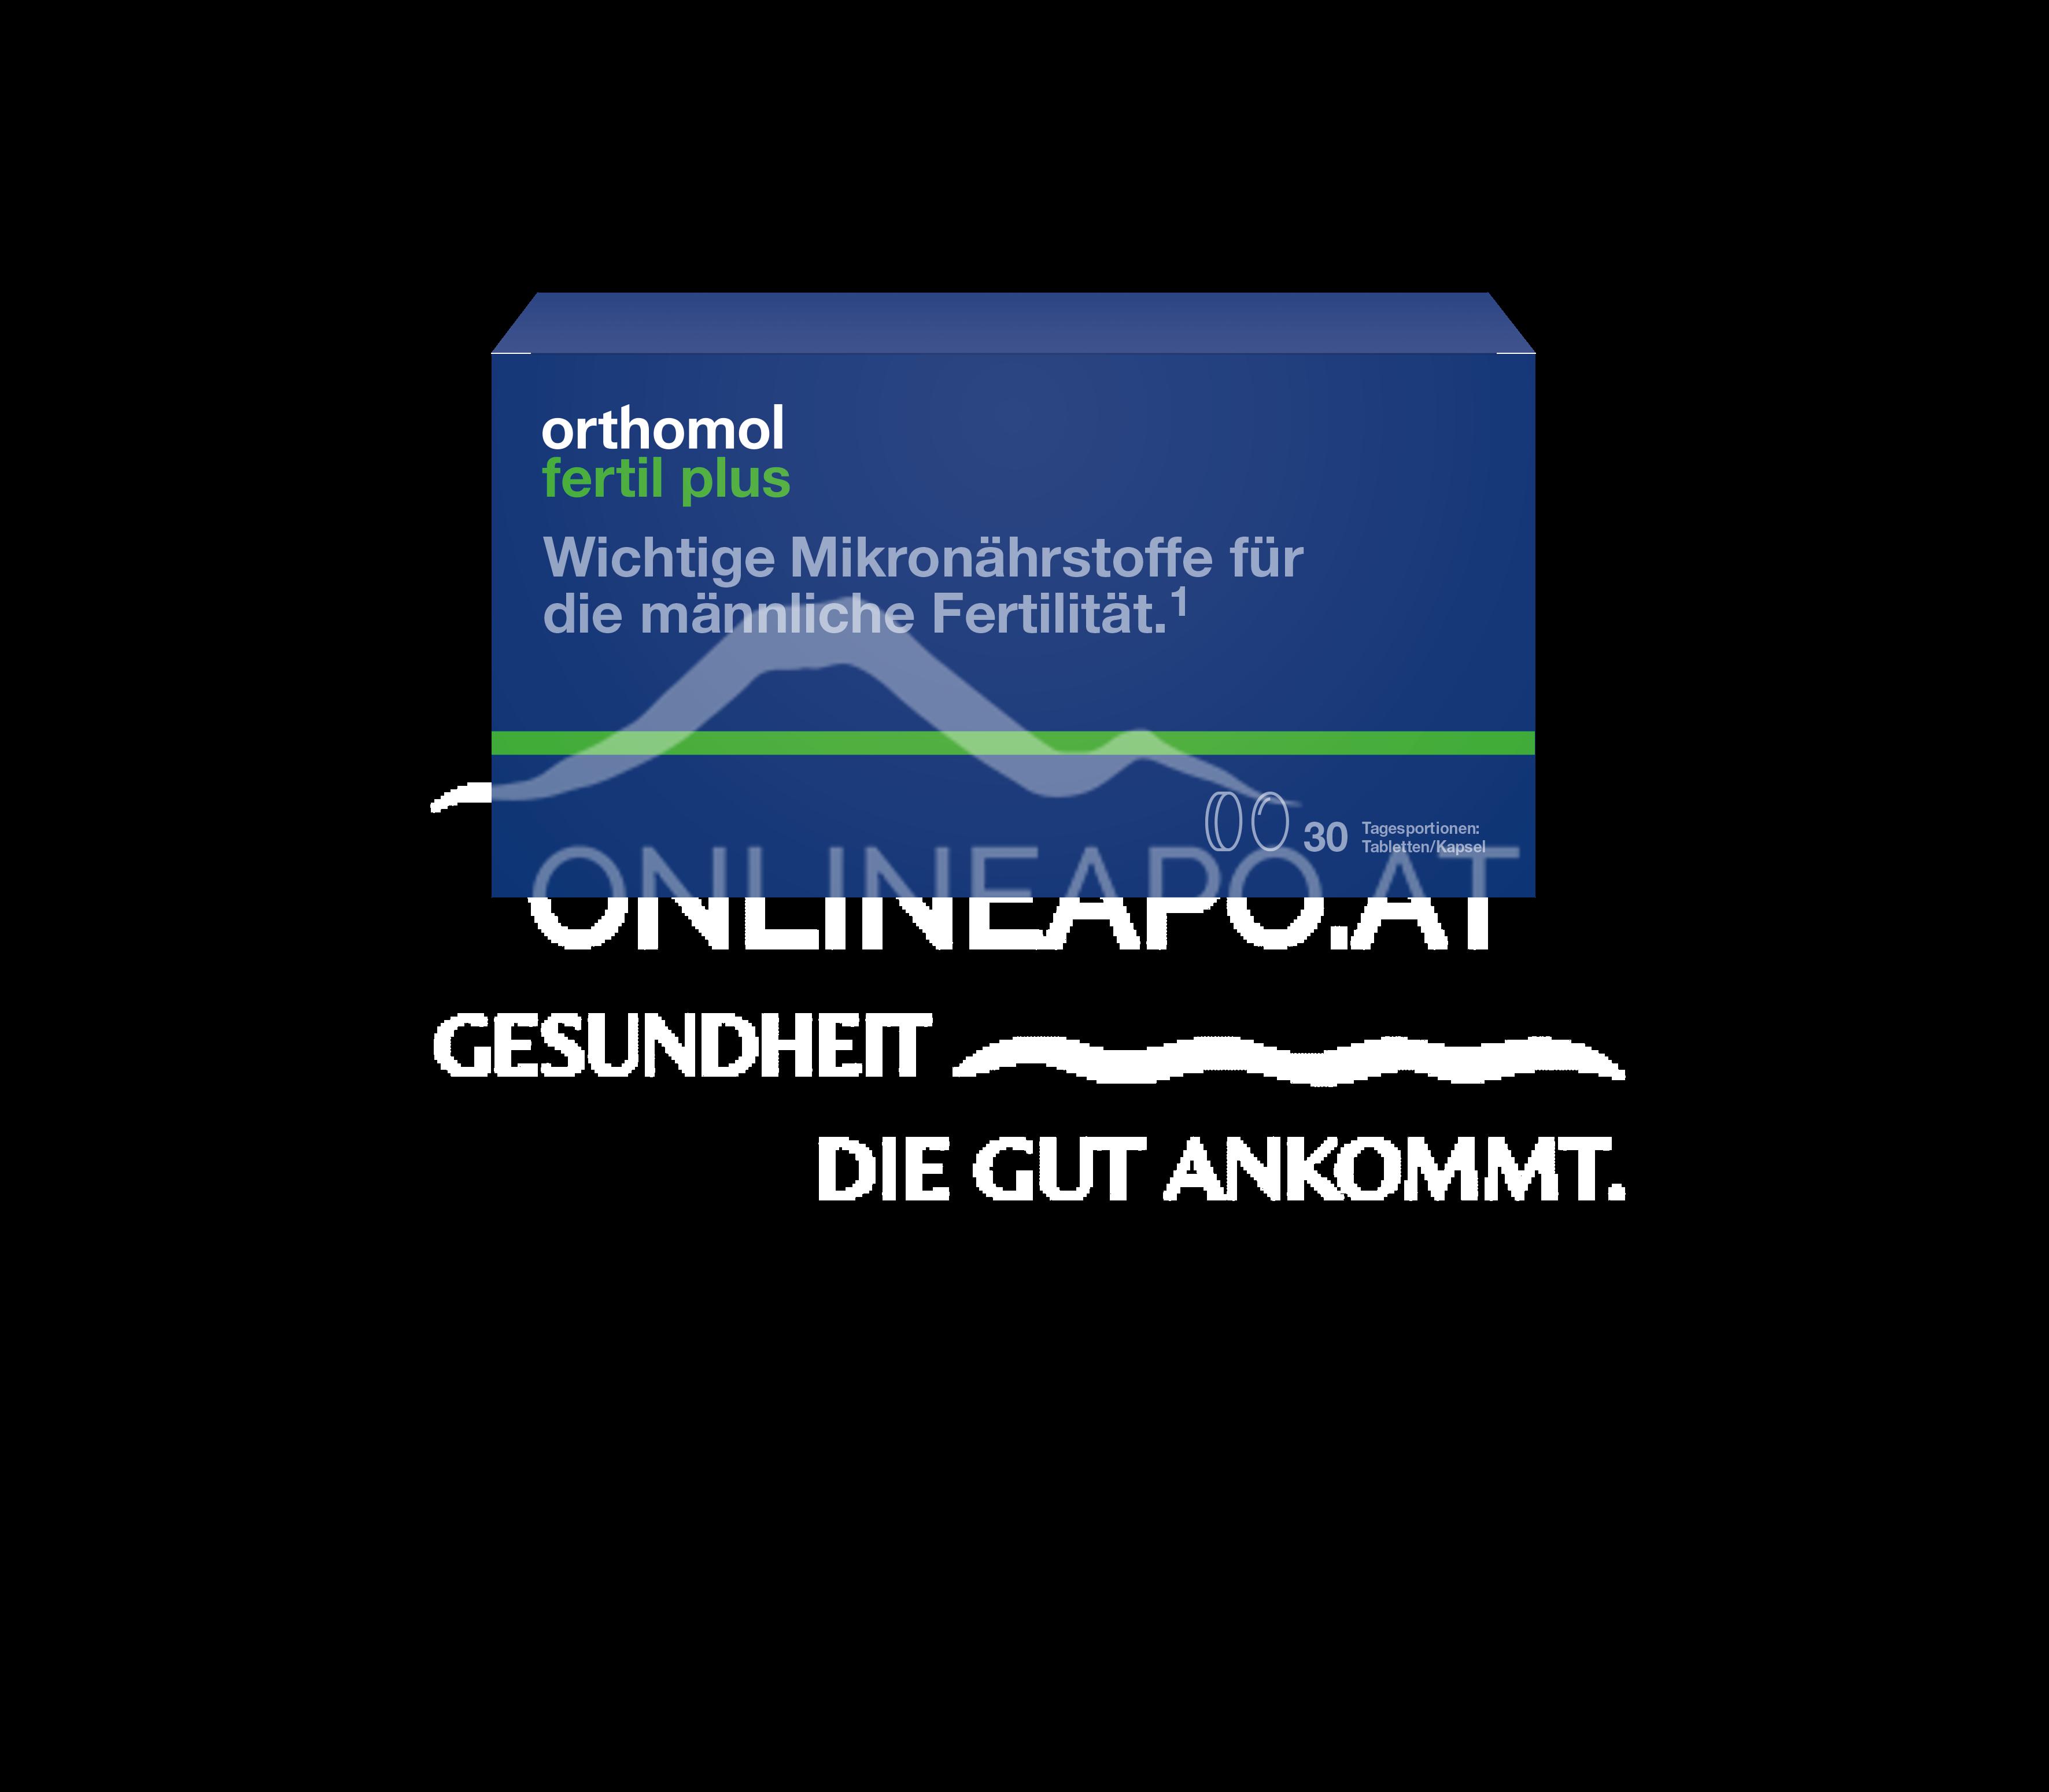 Orthomol Fertil Plus